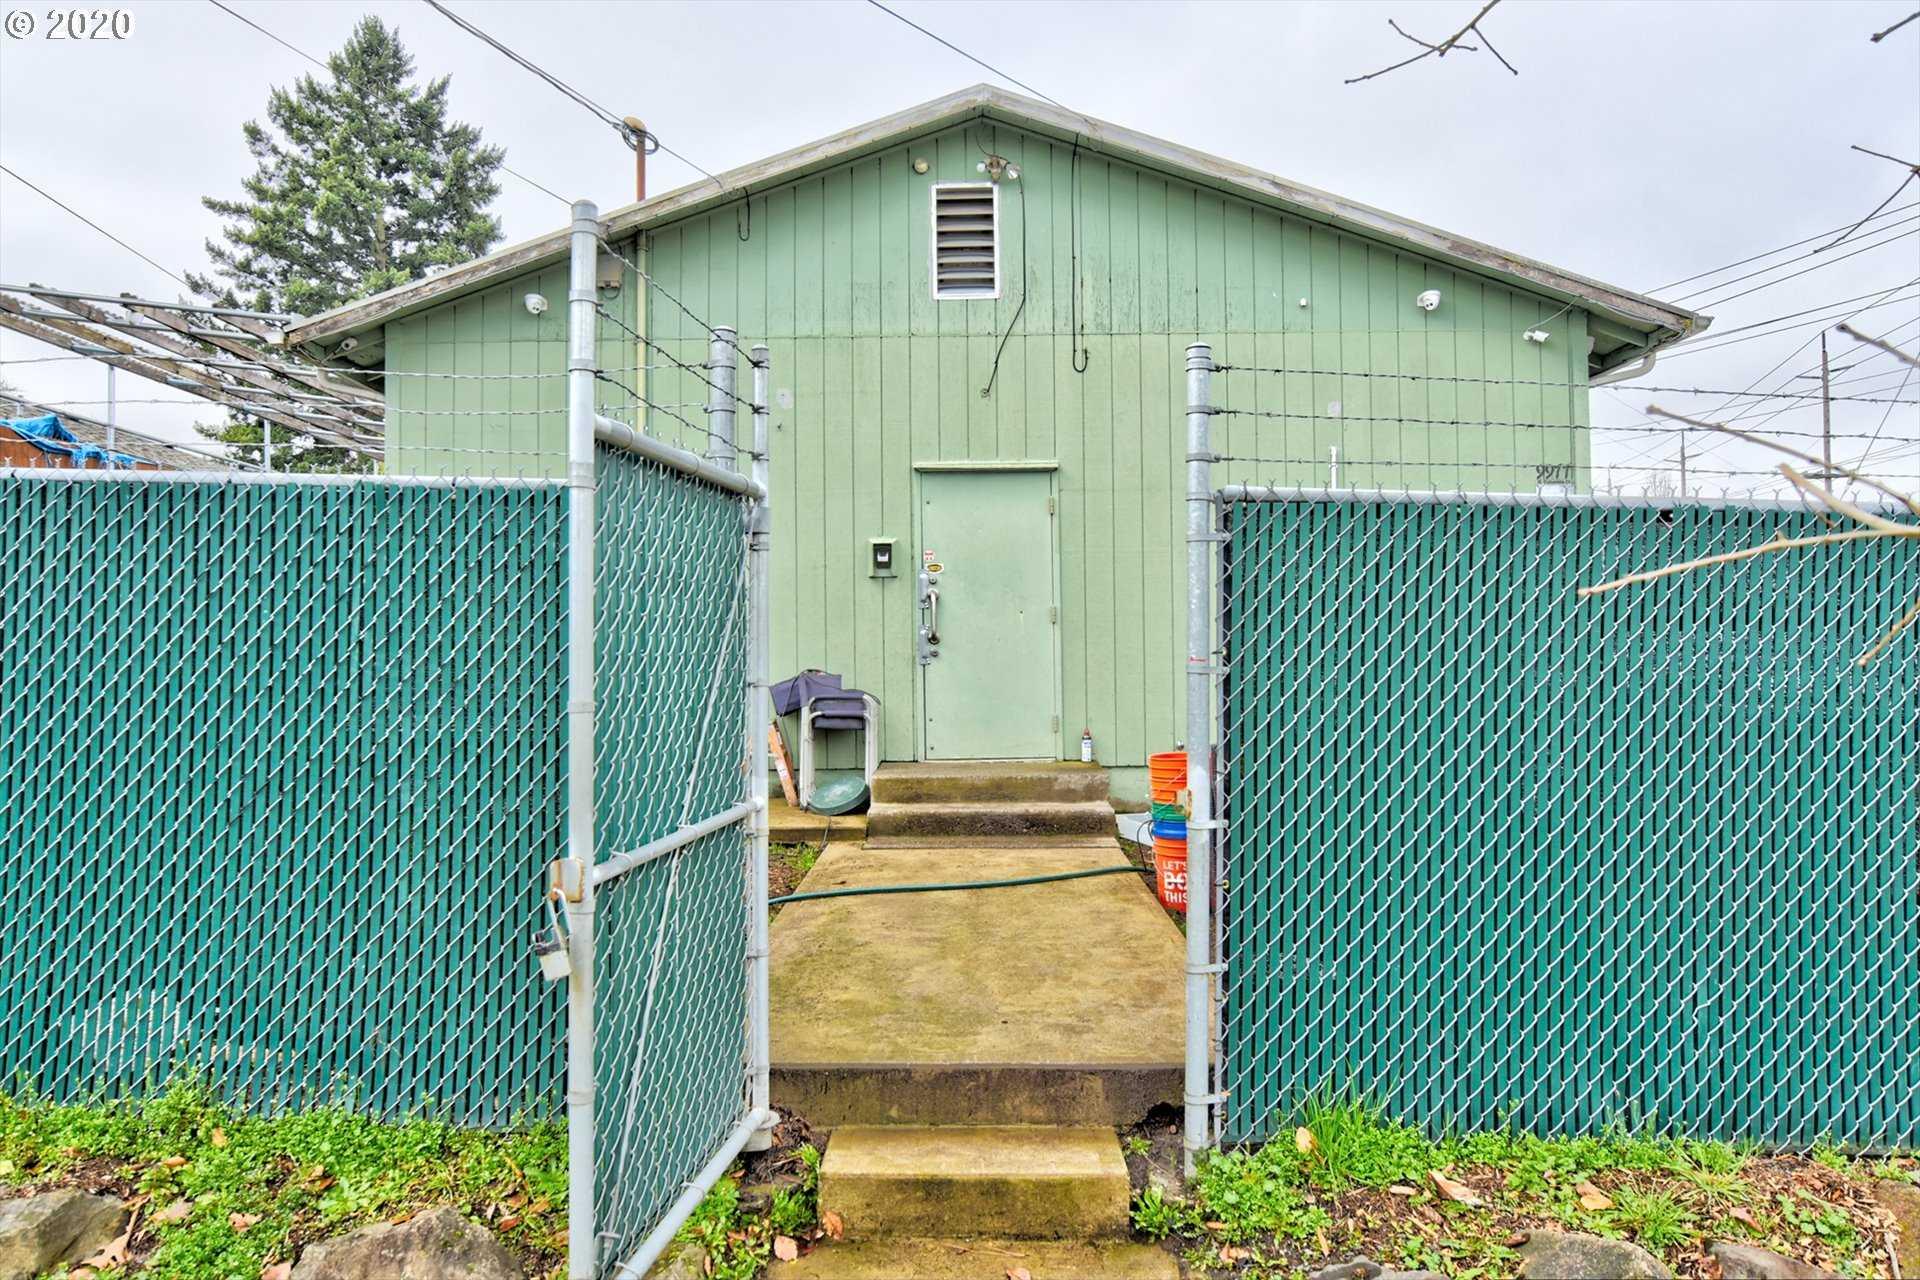 $2,950,000 - 1Br/1Ba -  for Sale in Portsmouth Neighborhood, Portland